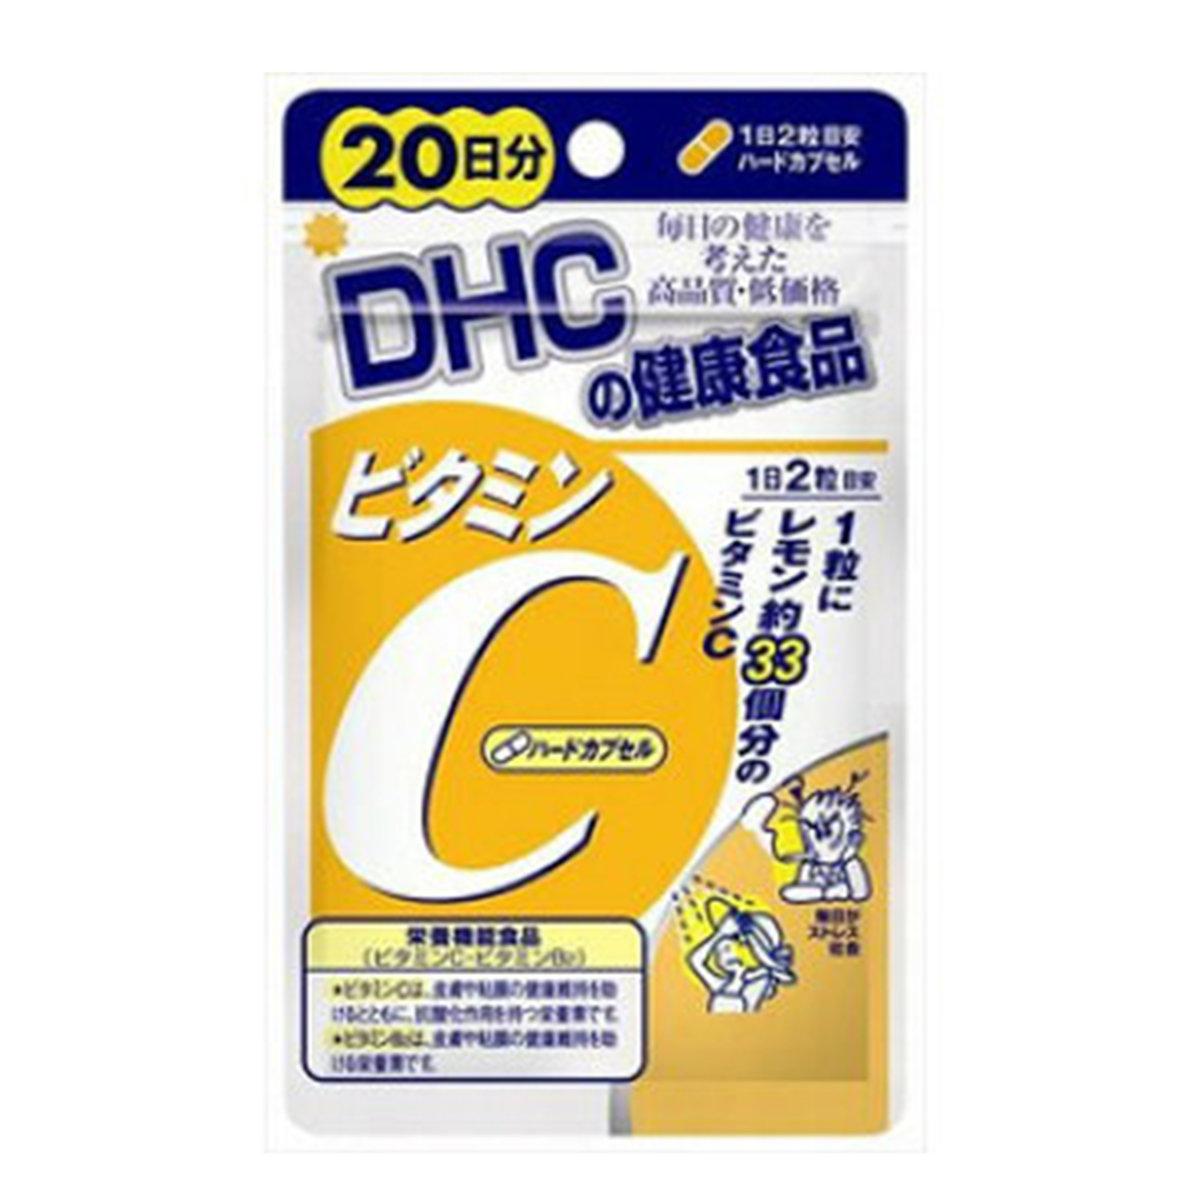 DHC維他命C(20日份) (平行進口)